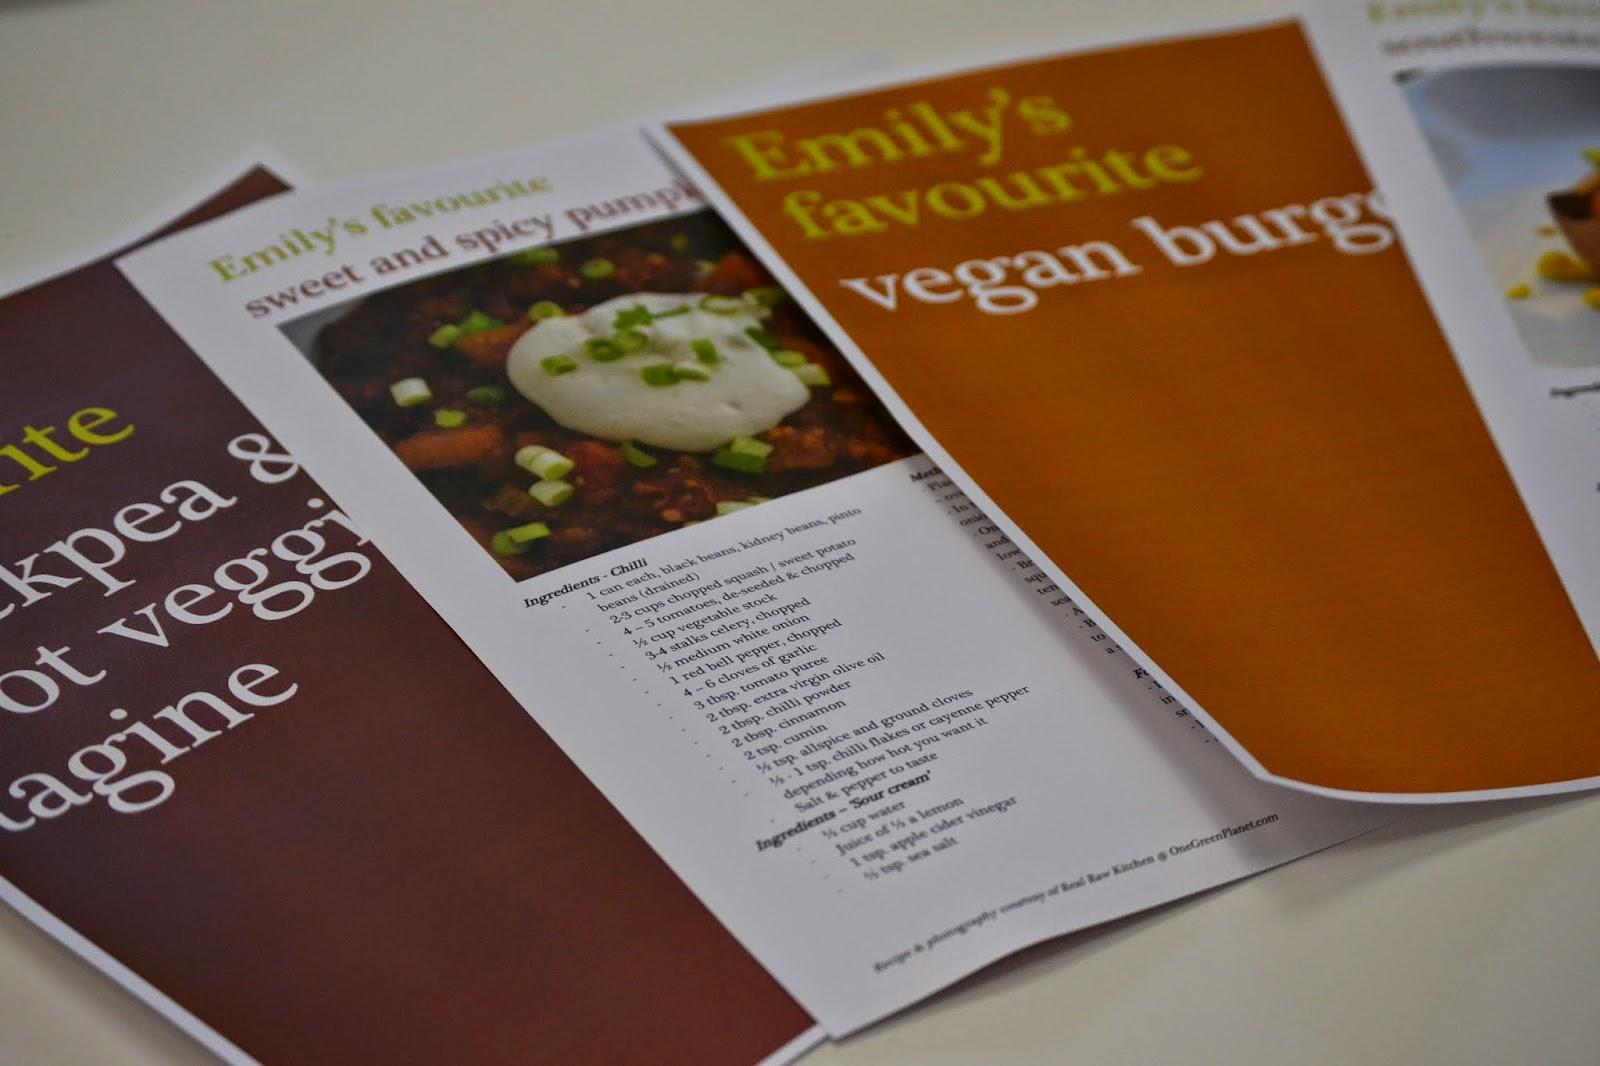 My favourite vegan recipes